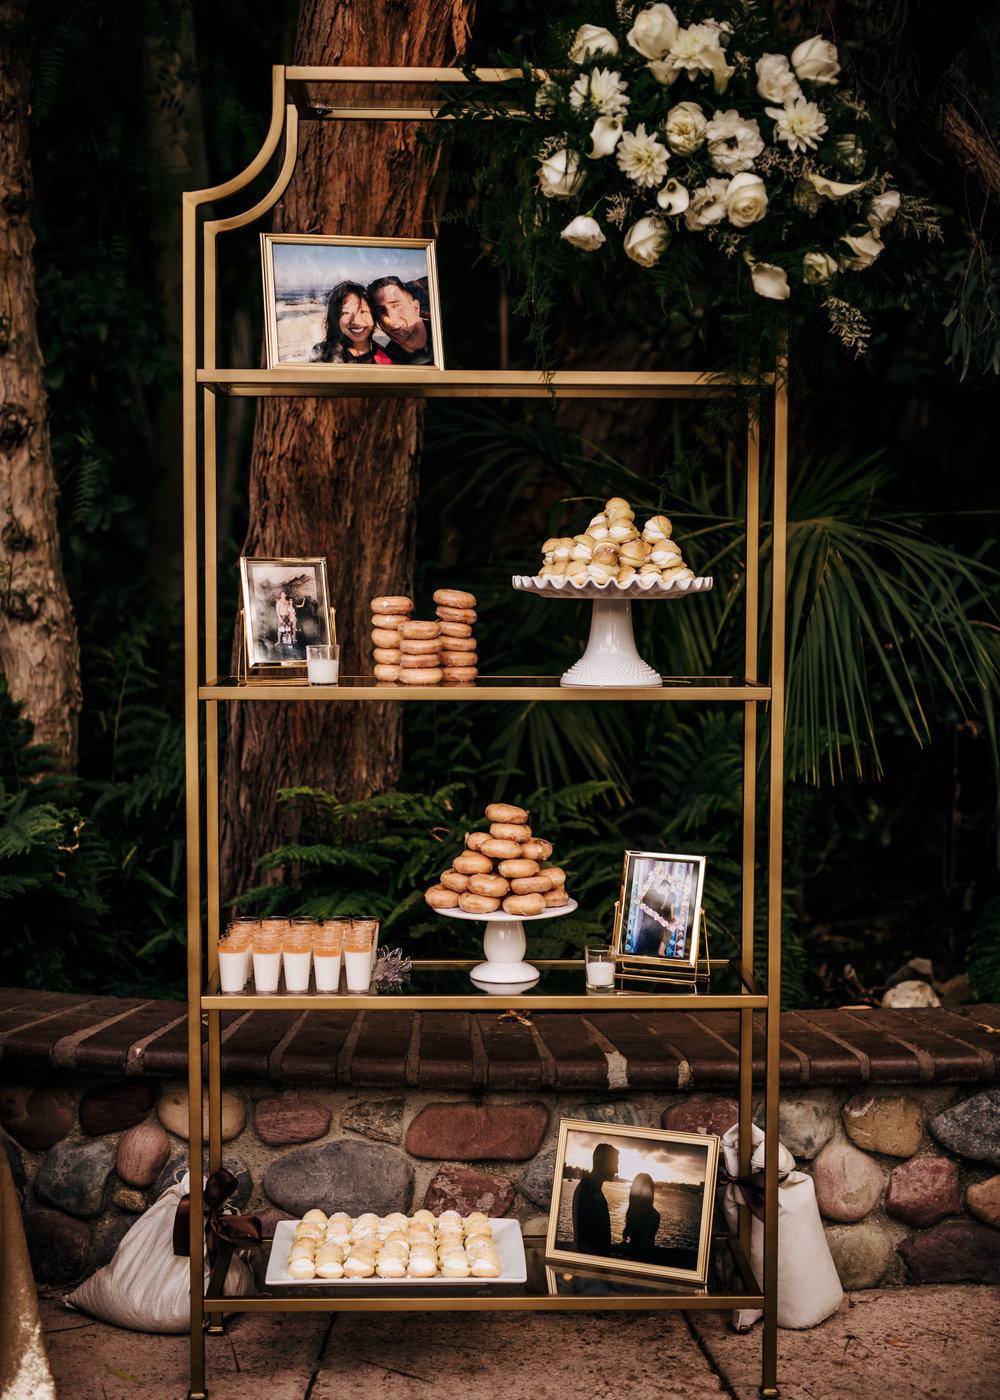 Turchin_20180825_Austinae-Brent-Wedding_439.jpg